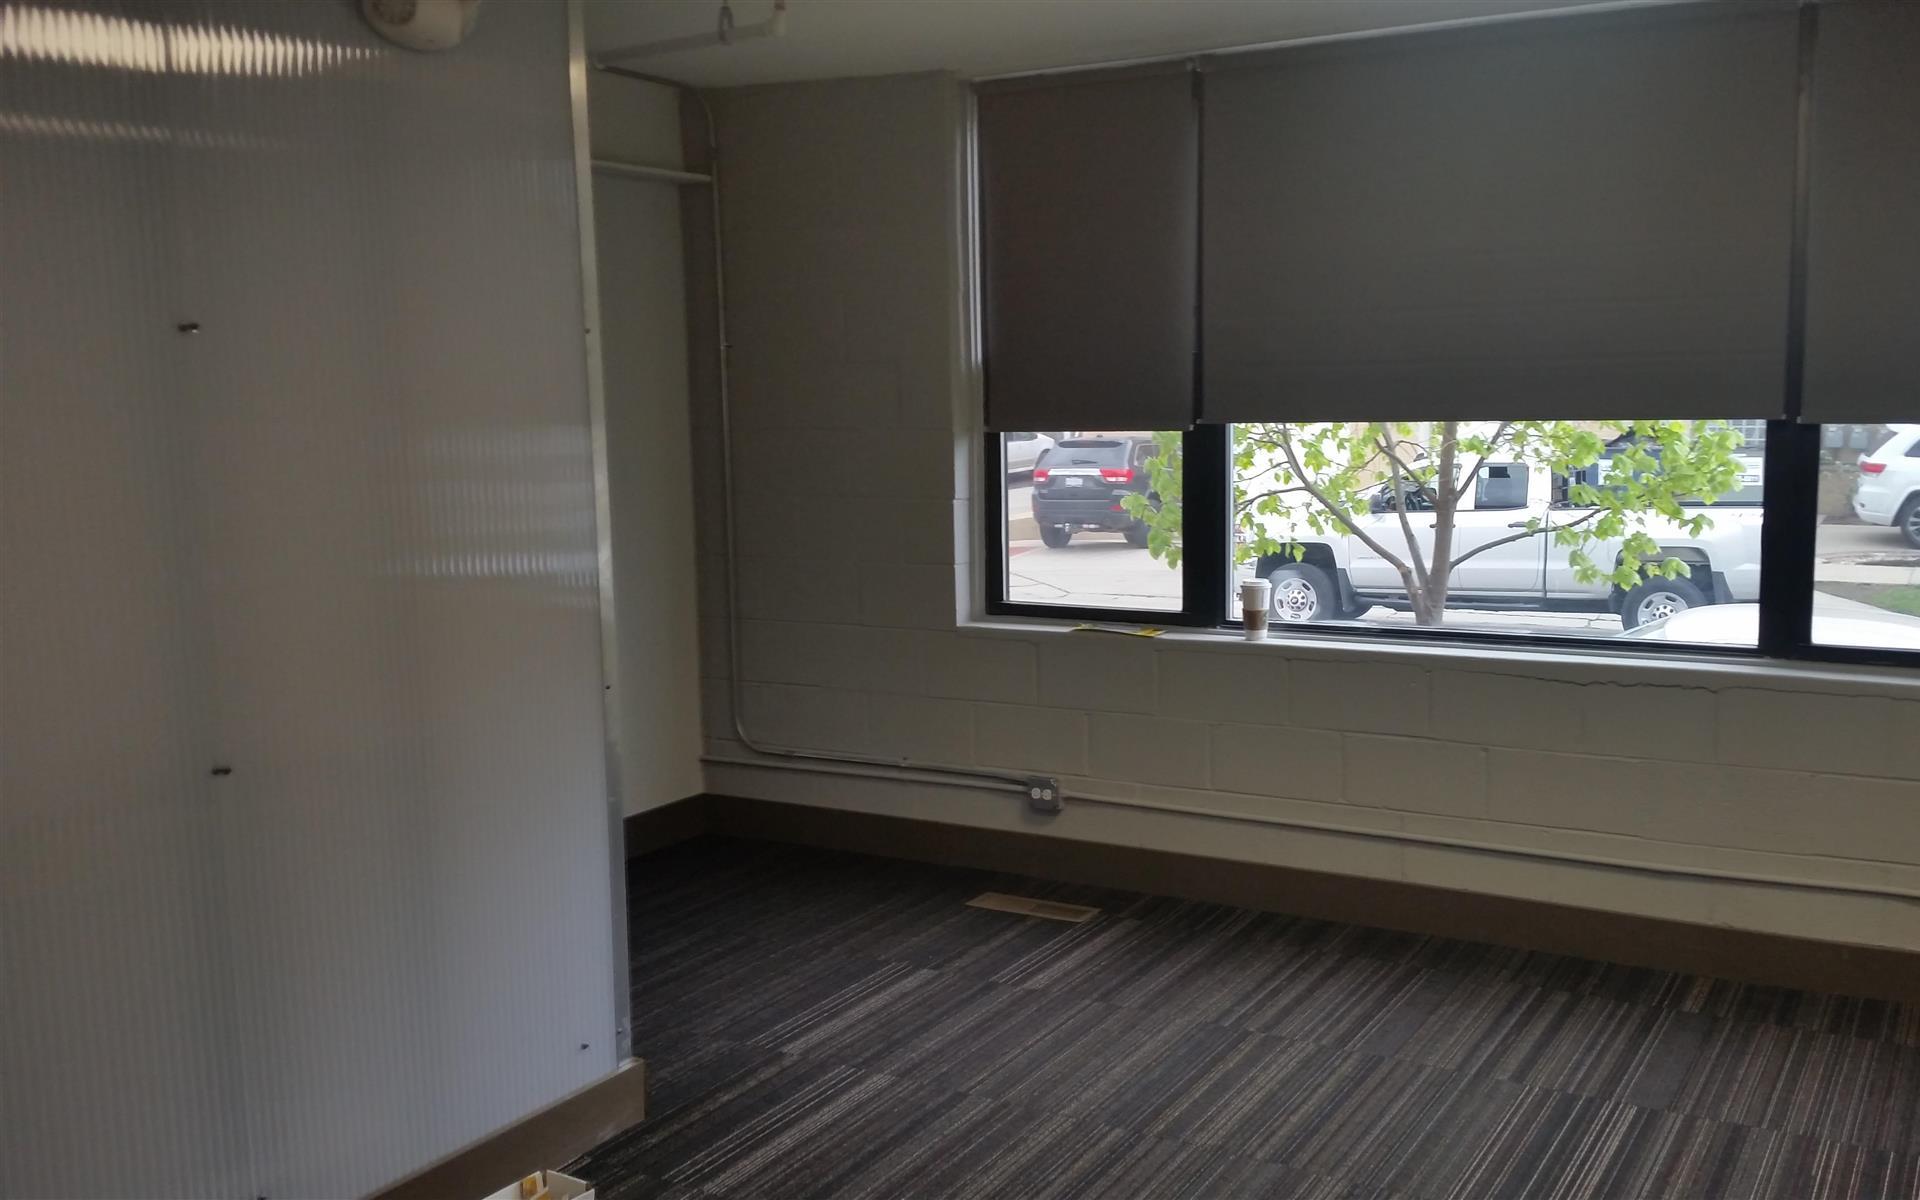 8042-8052 monticello - Office 103